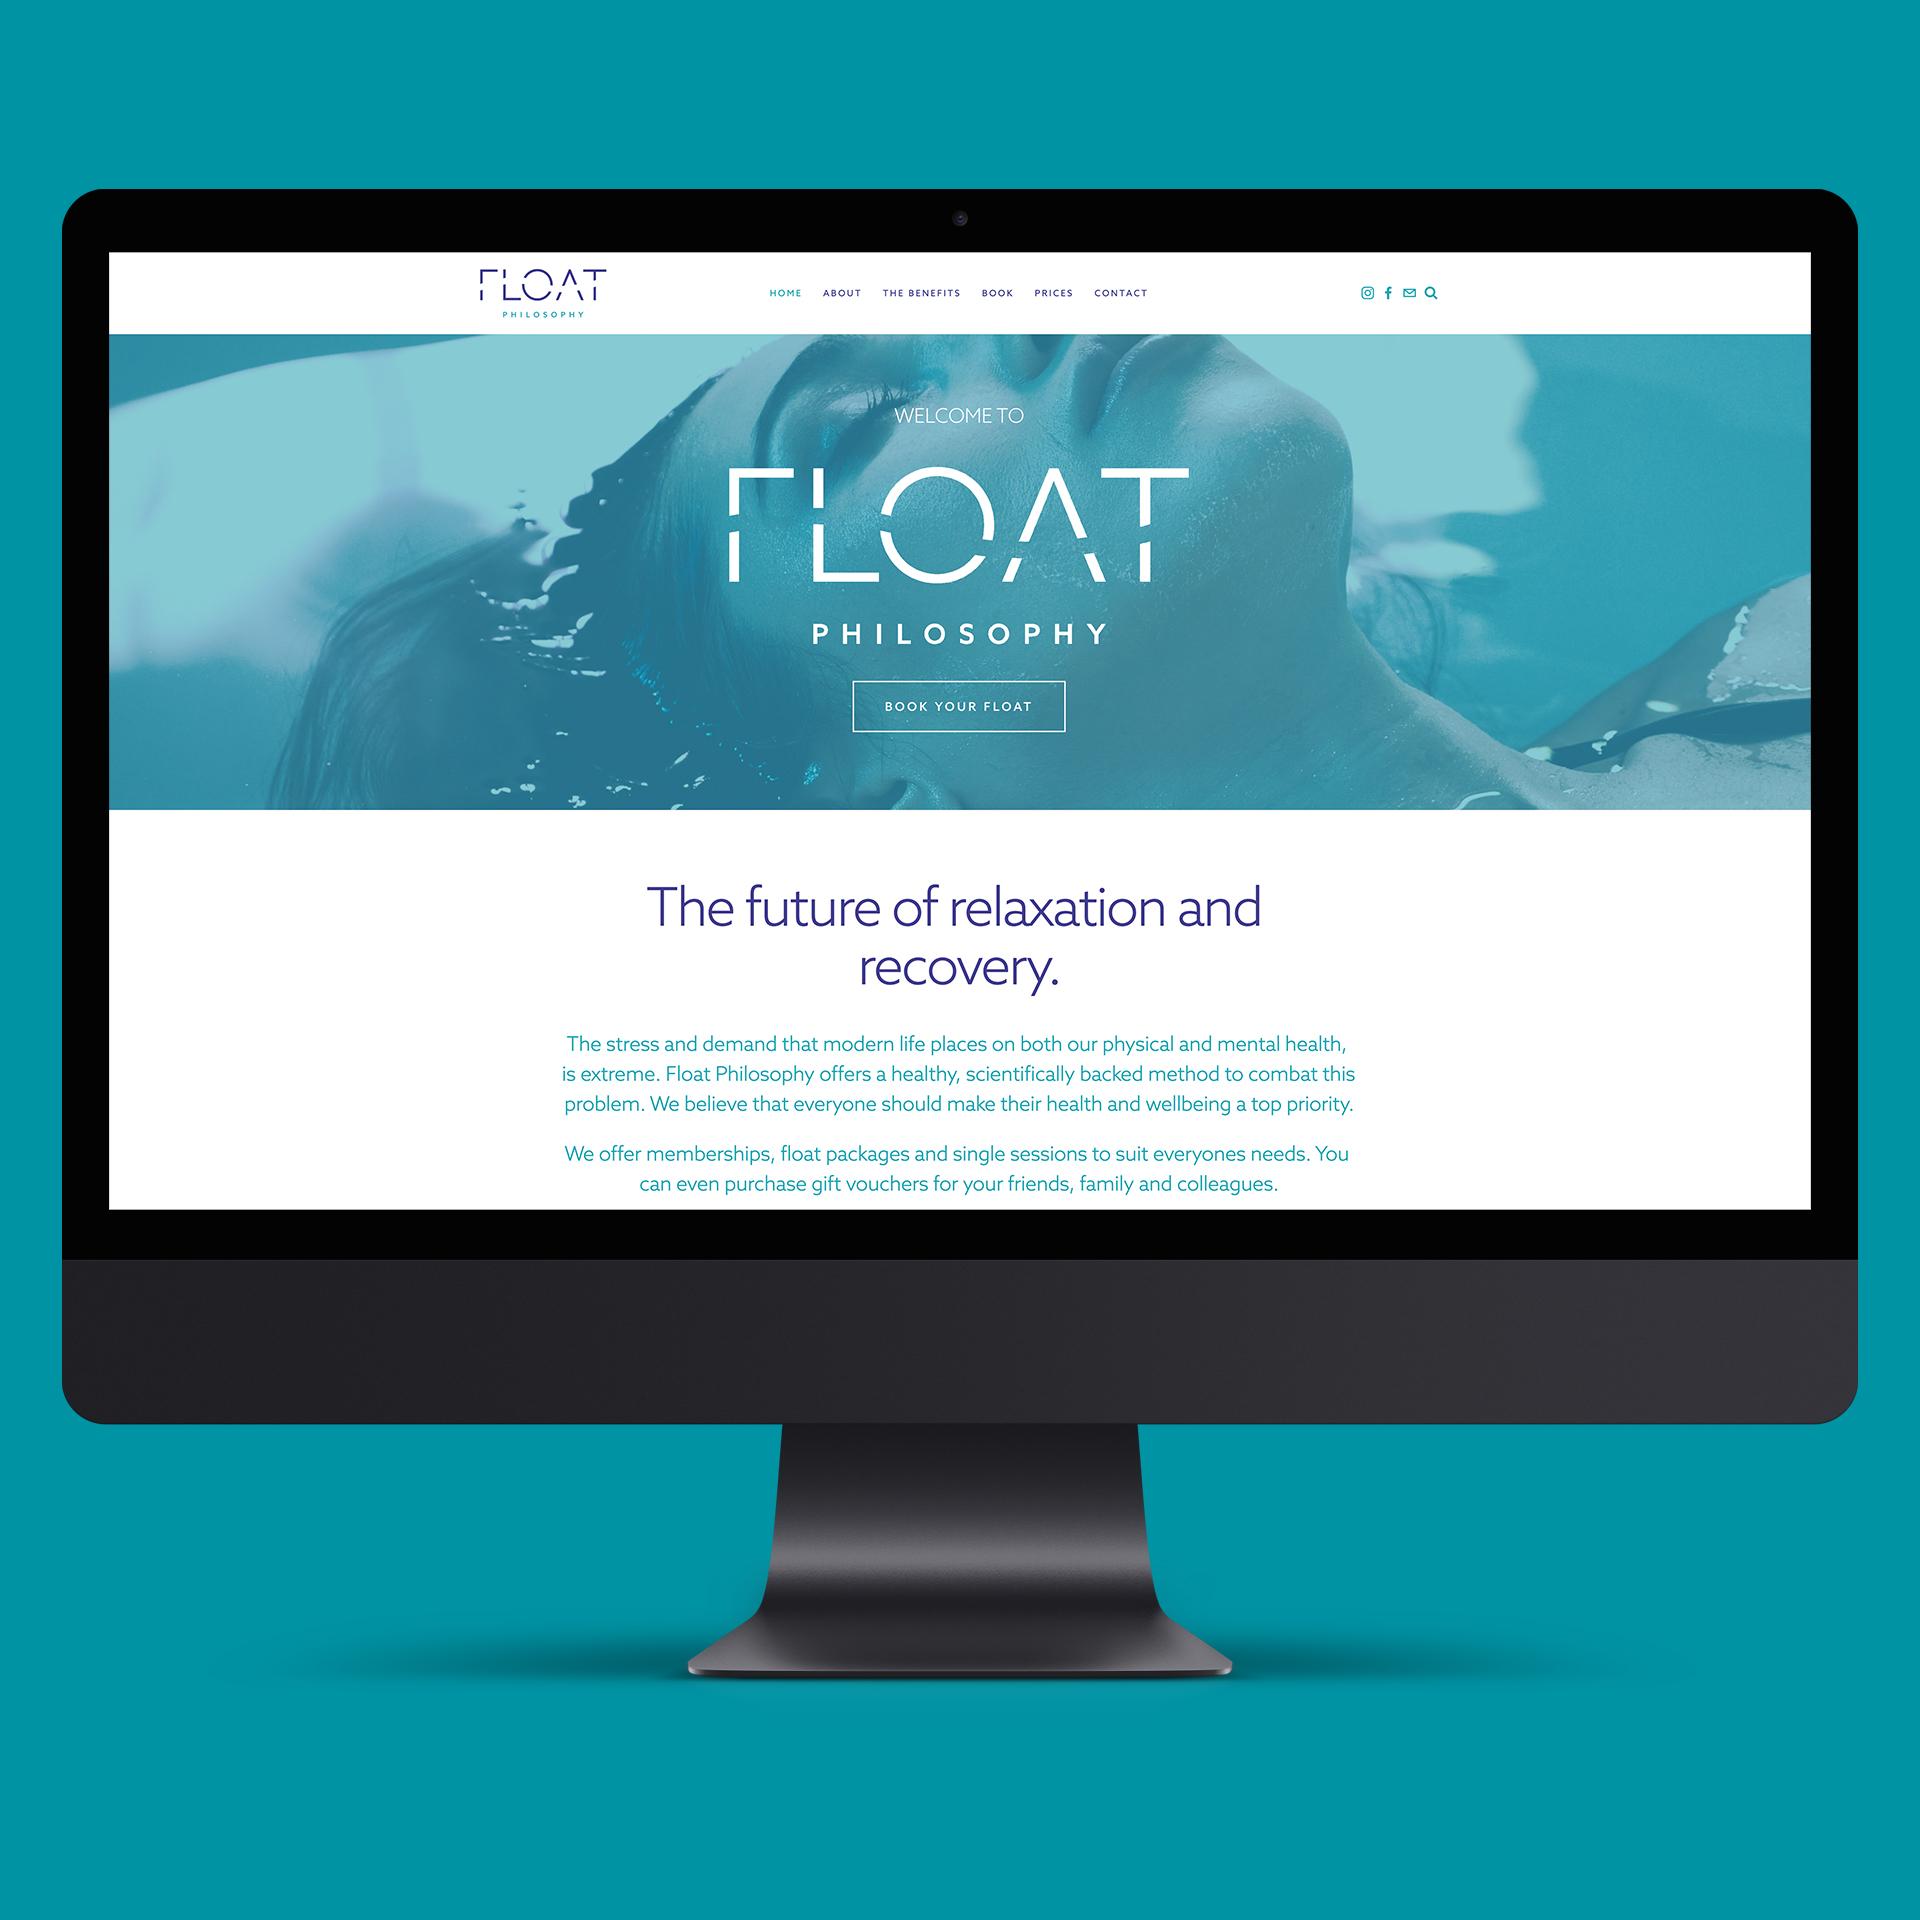 floatphilosophy.com